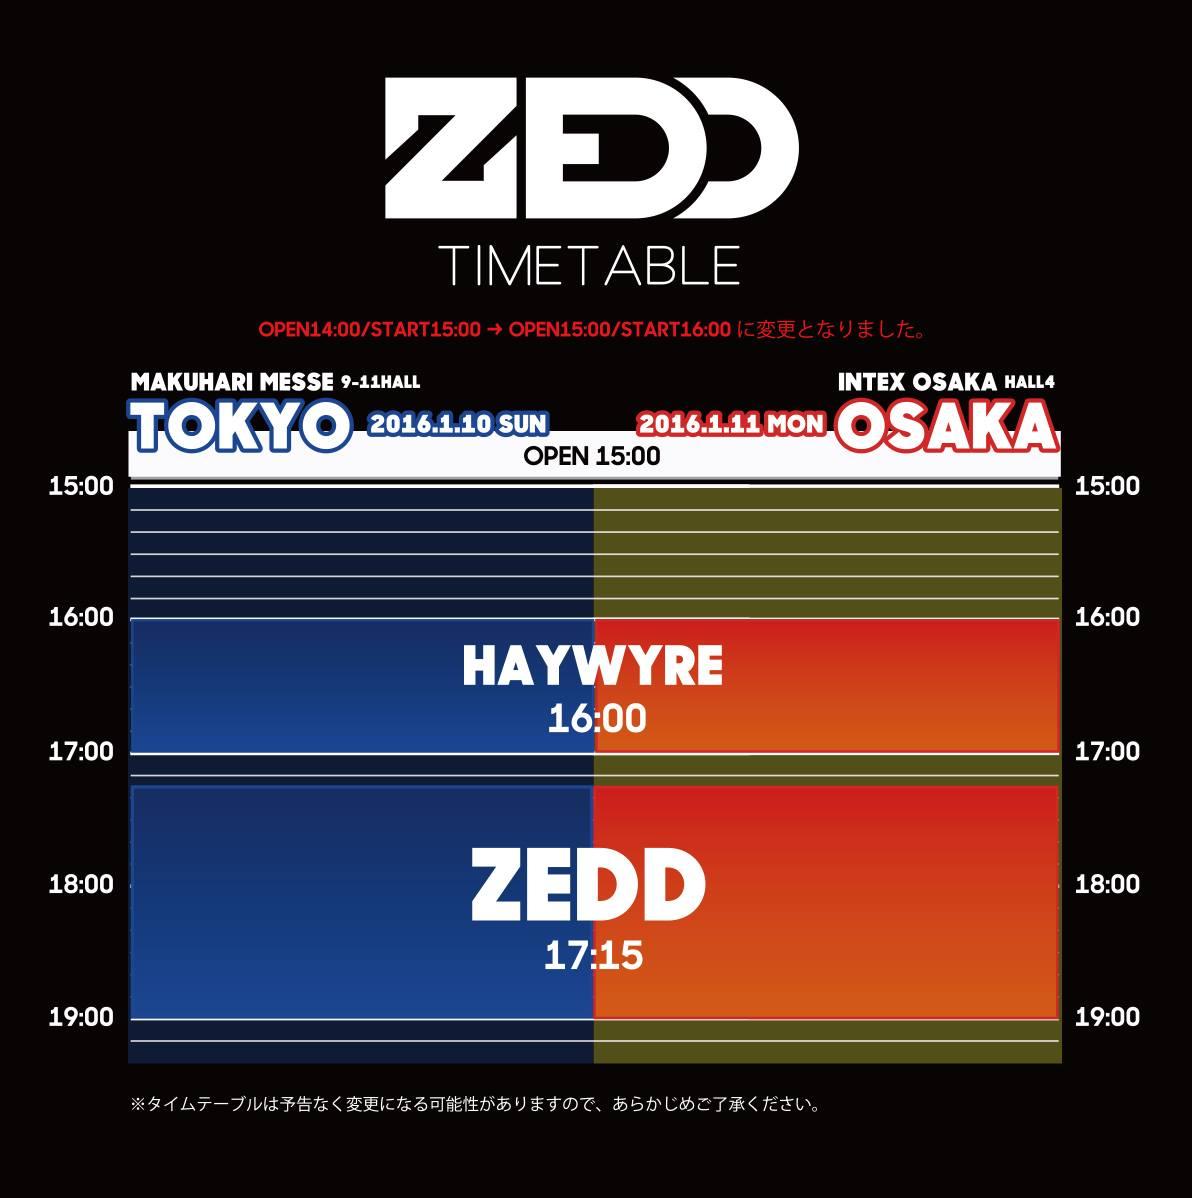 ZEDD Timetable 20160110